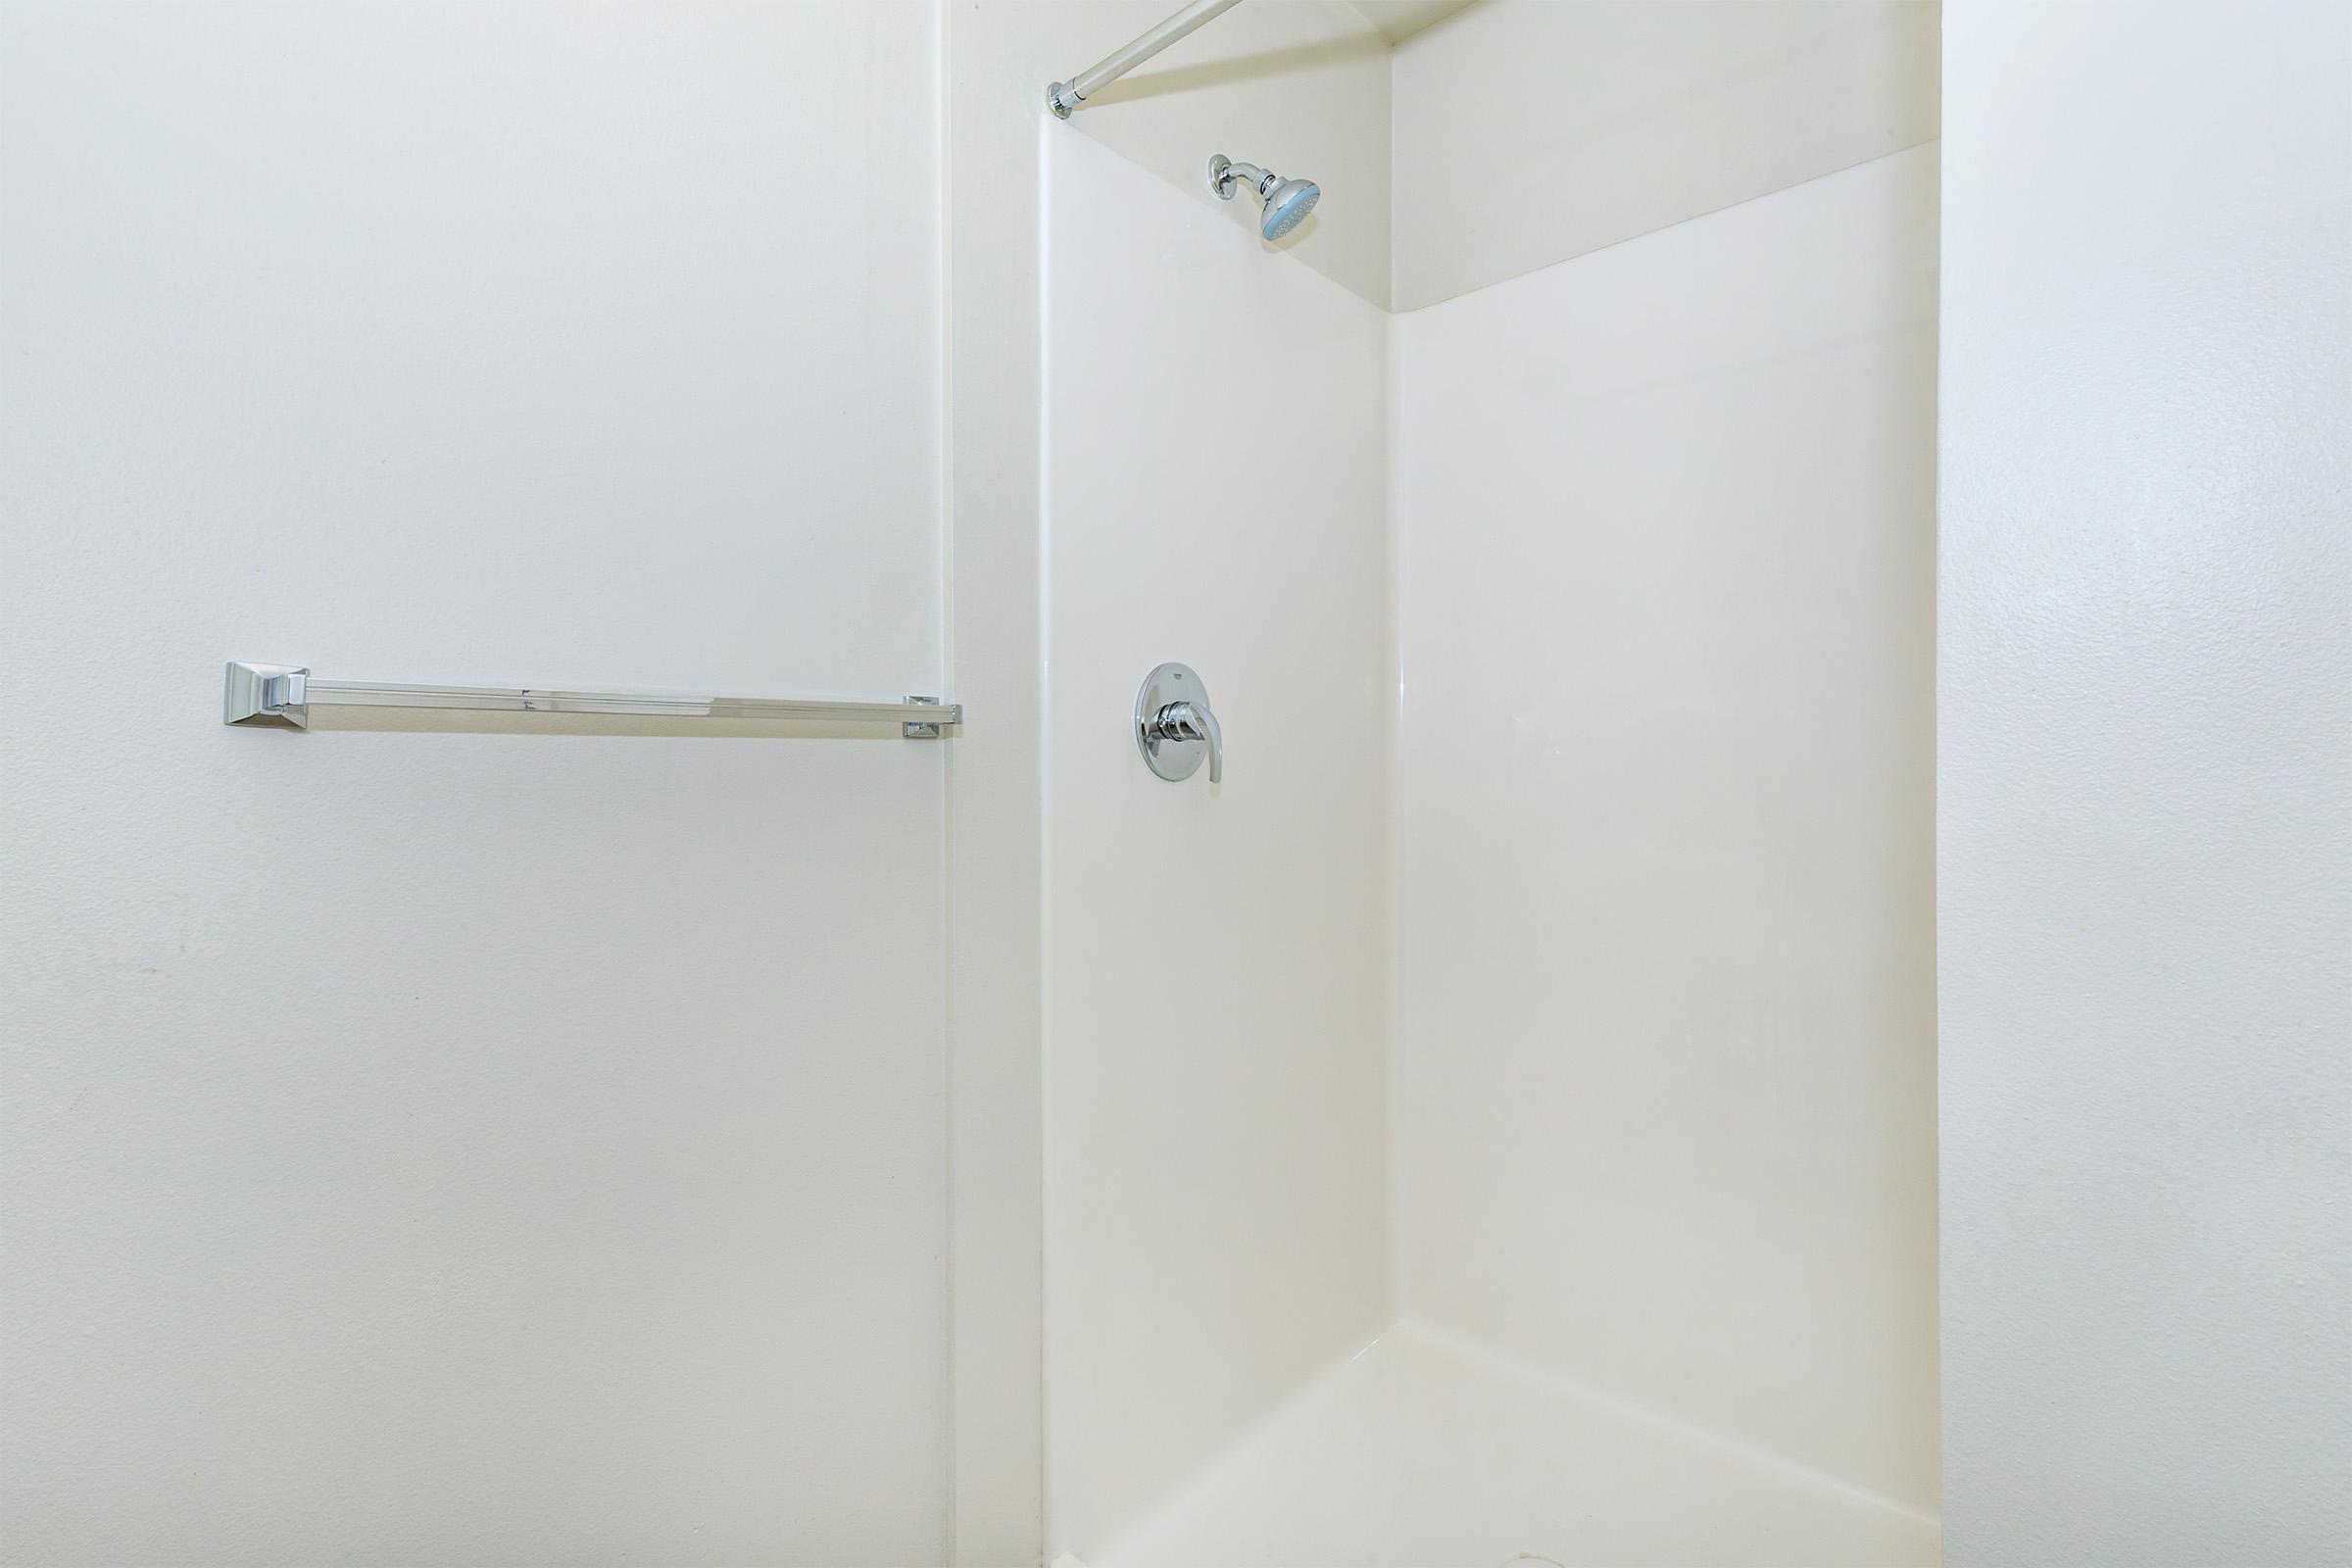 a close up of a shower